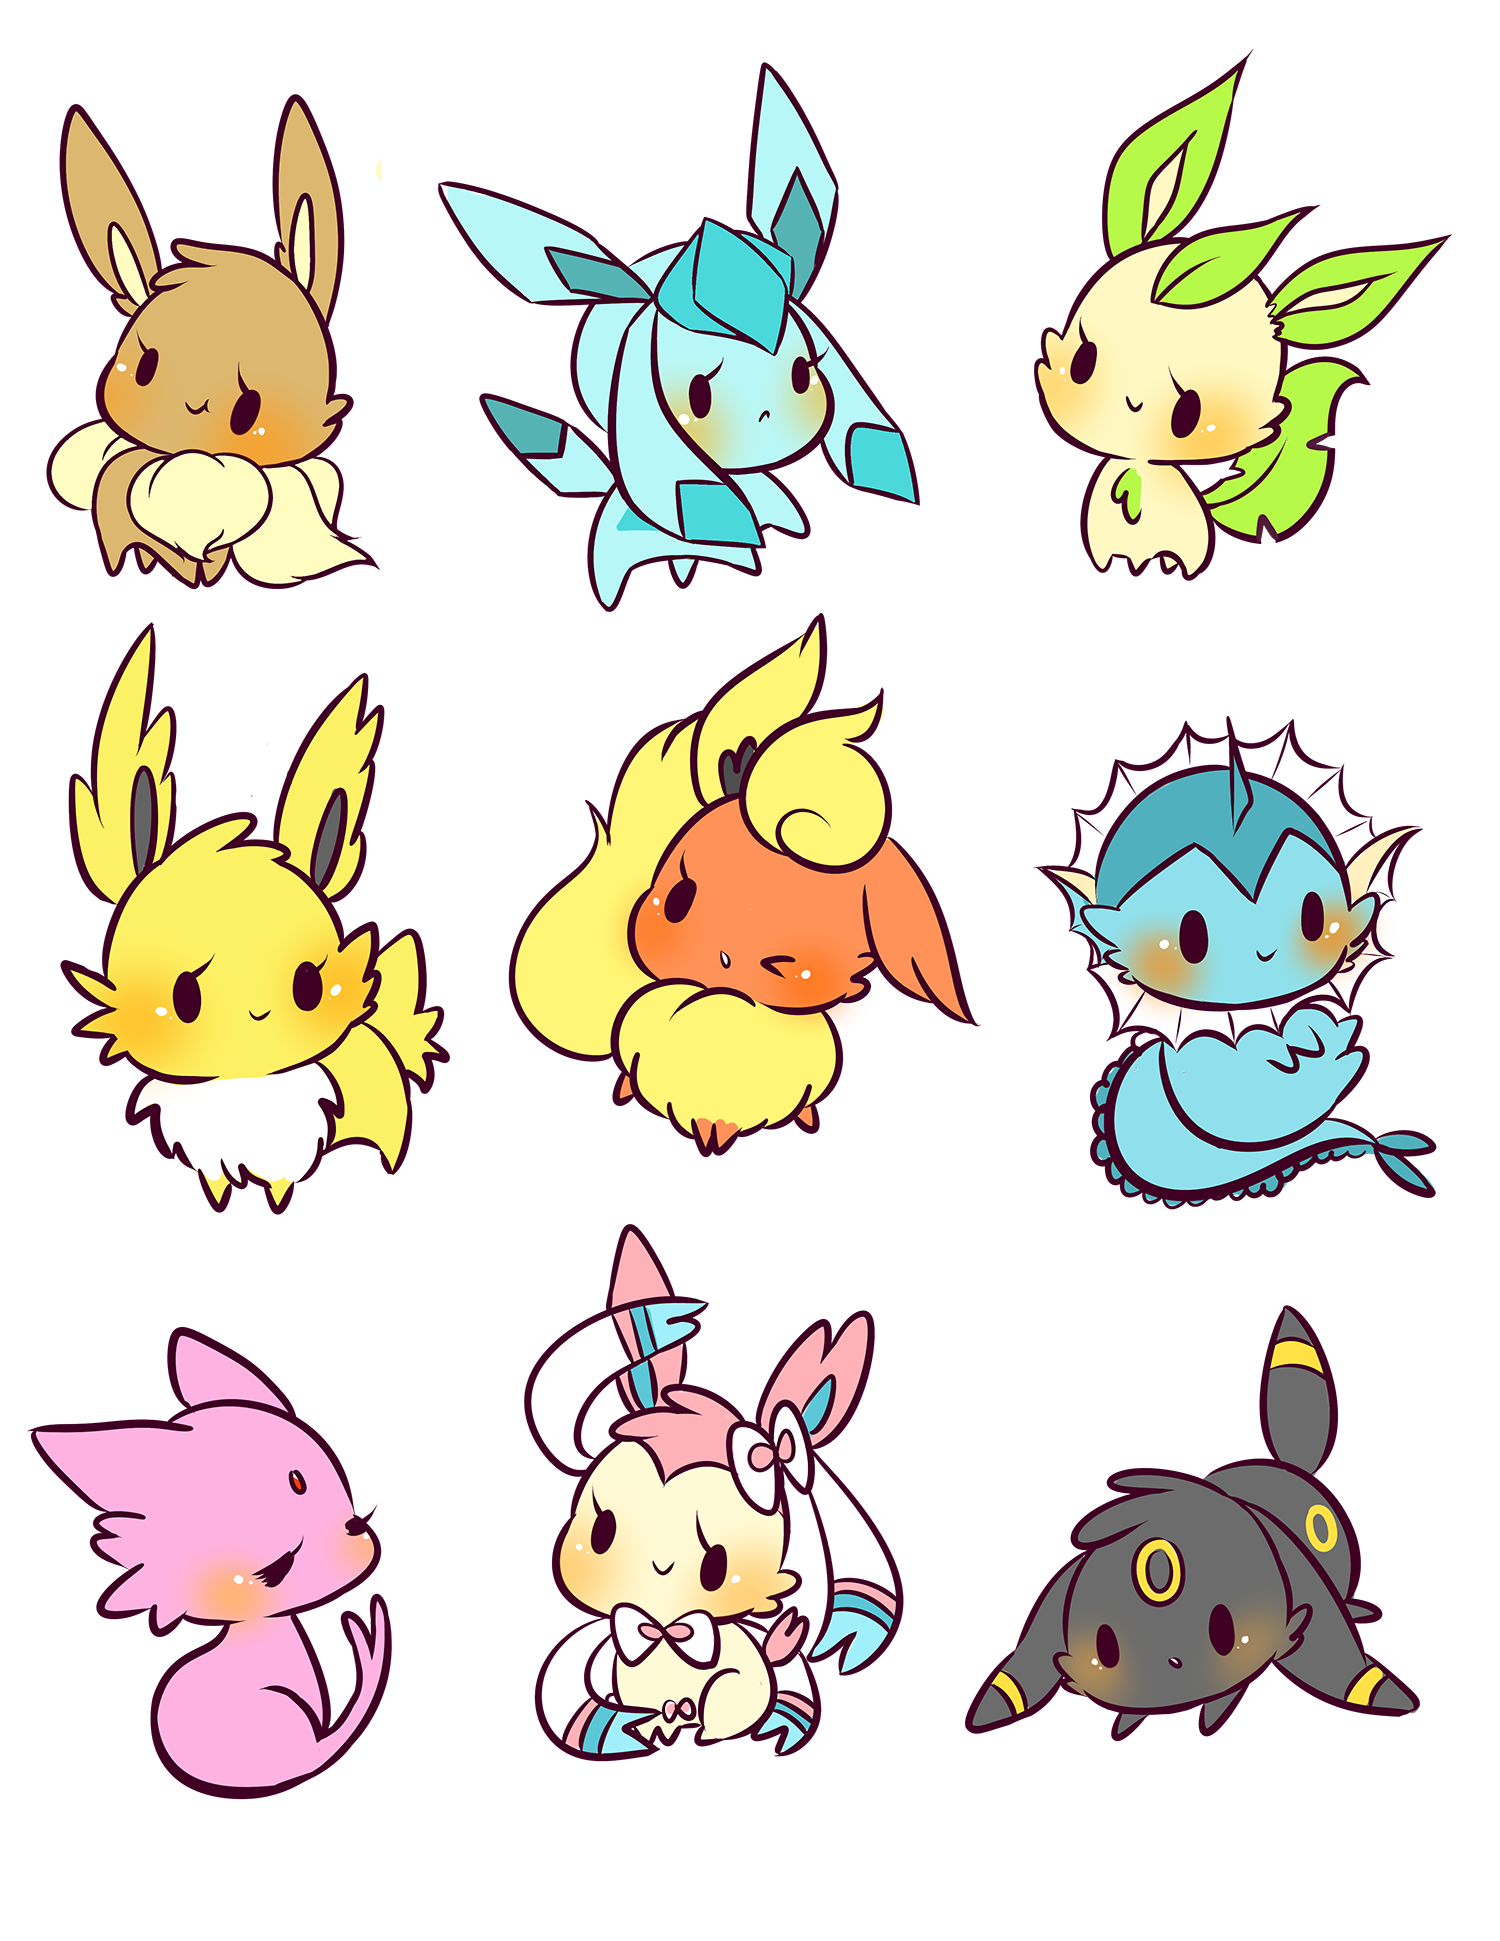 Eeveelution buttons from birduyen Note and Pokémon